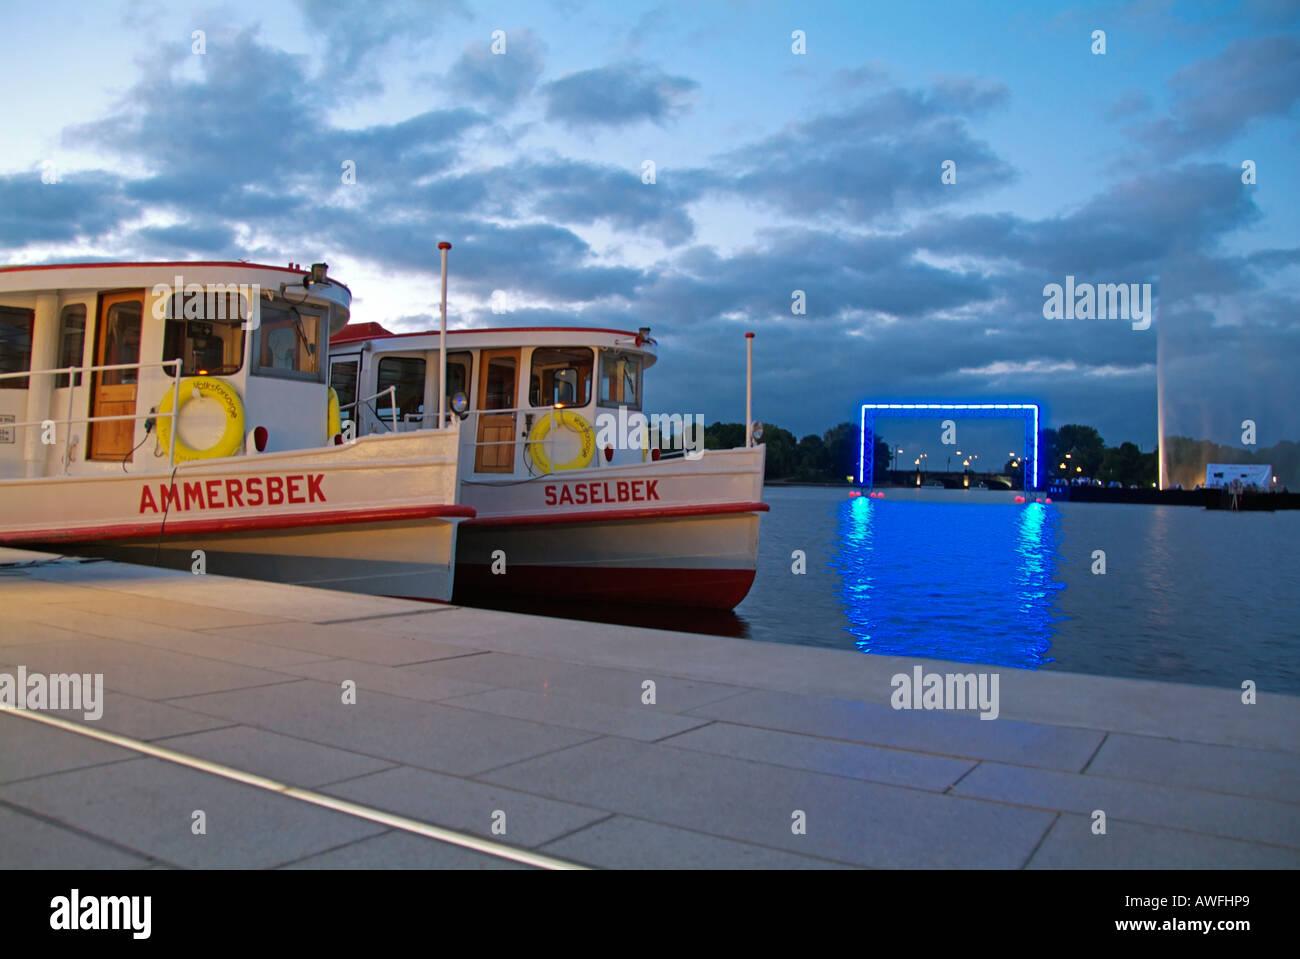 blue hour, sun down, sunset - Jungfernstieg with Alsterships Boats, Landmark of Hamburg, Germany, Europe - Stock Image